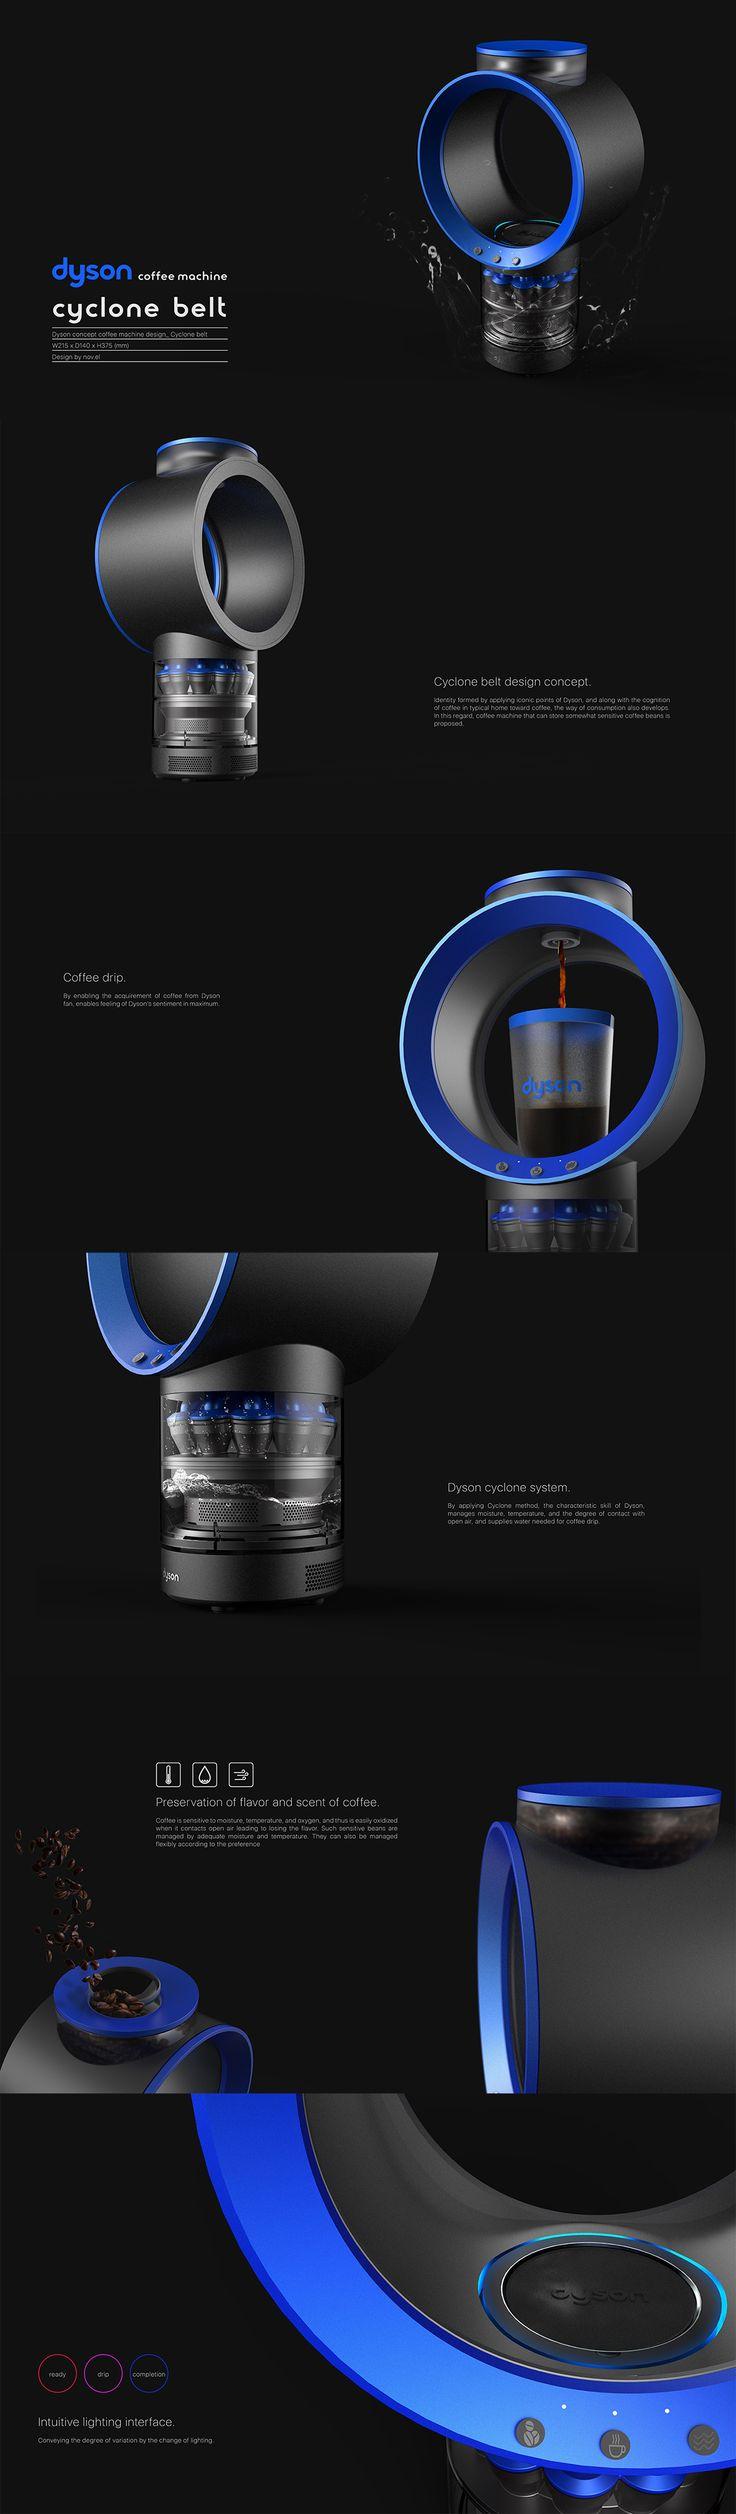 Product design / Industrial design / 제품디자인 / 산업디자인 / coffee machine / dyson /design